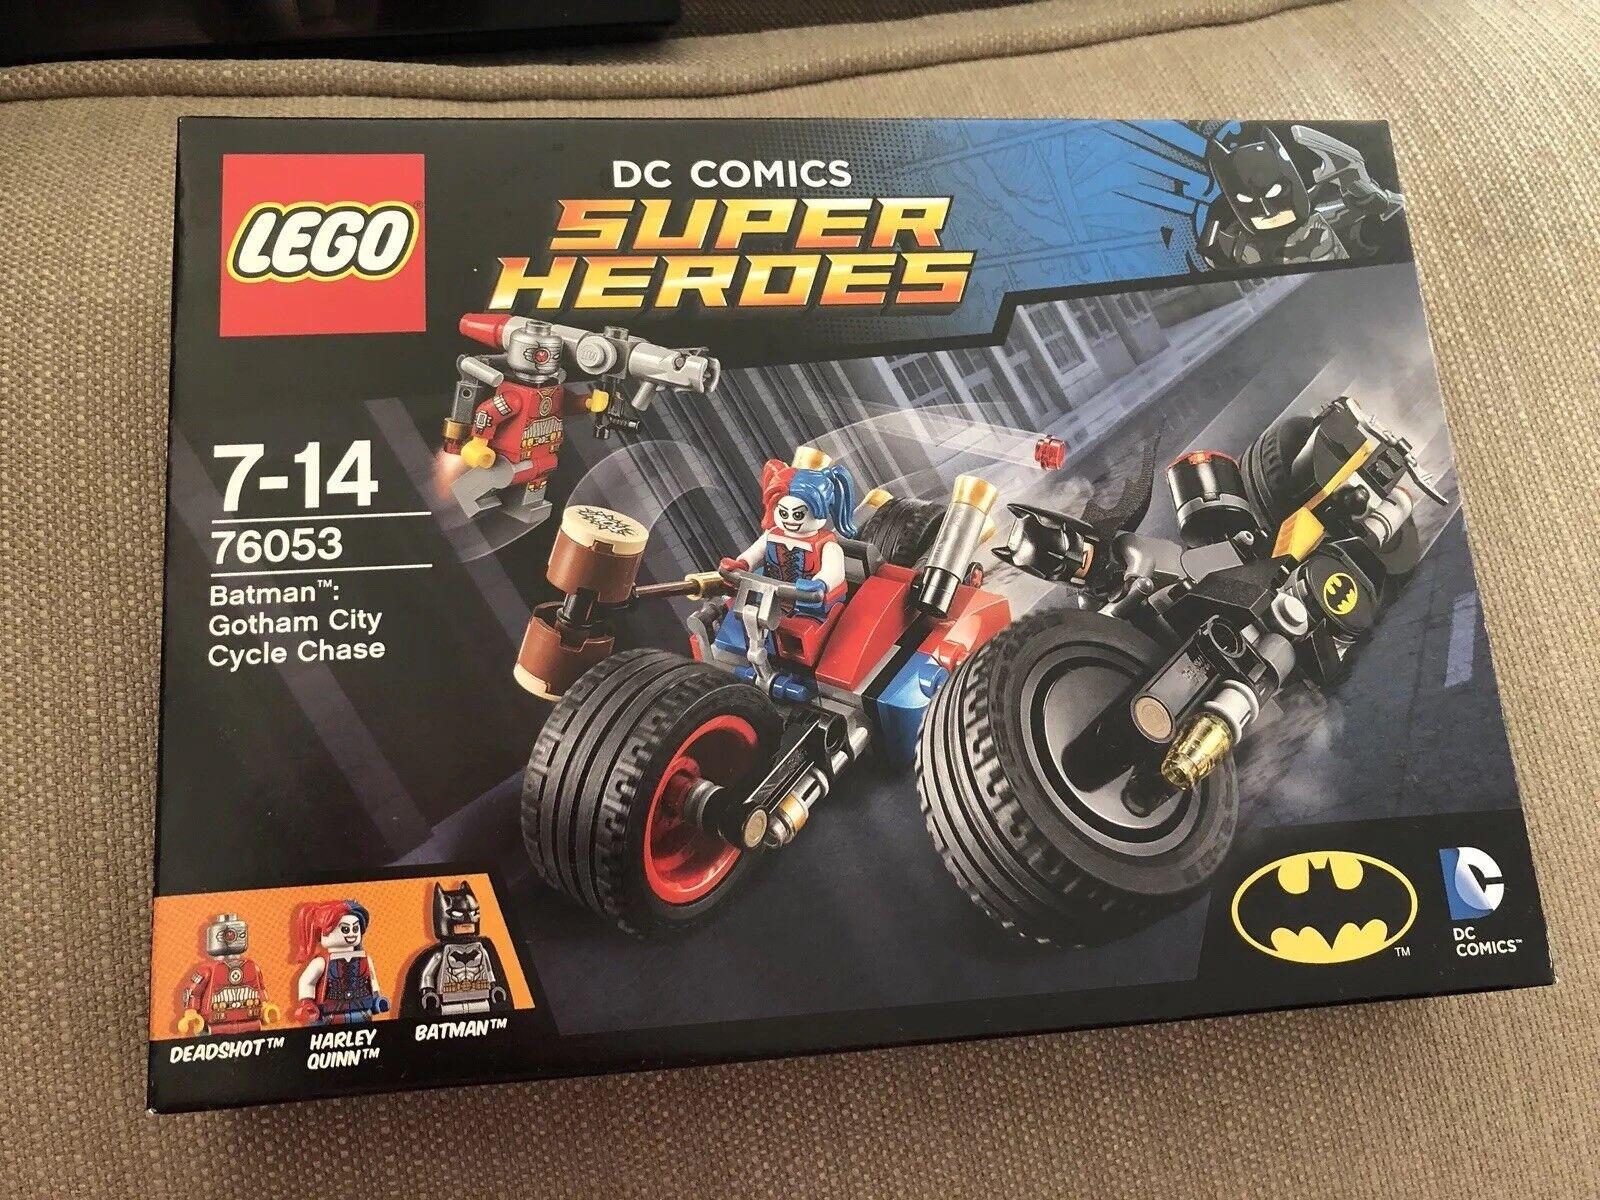 Lego DC Comics Super Heroes 76053 Batman  Gotham City Cycle Chase - BNIB